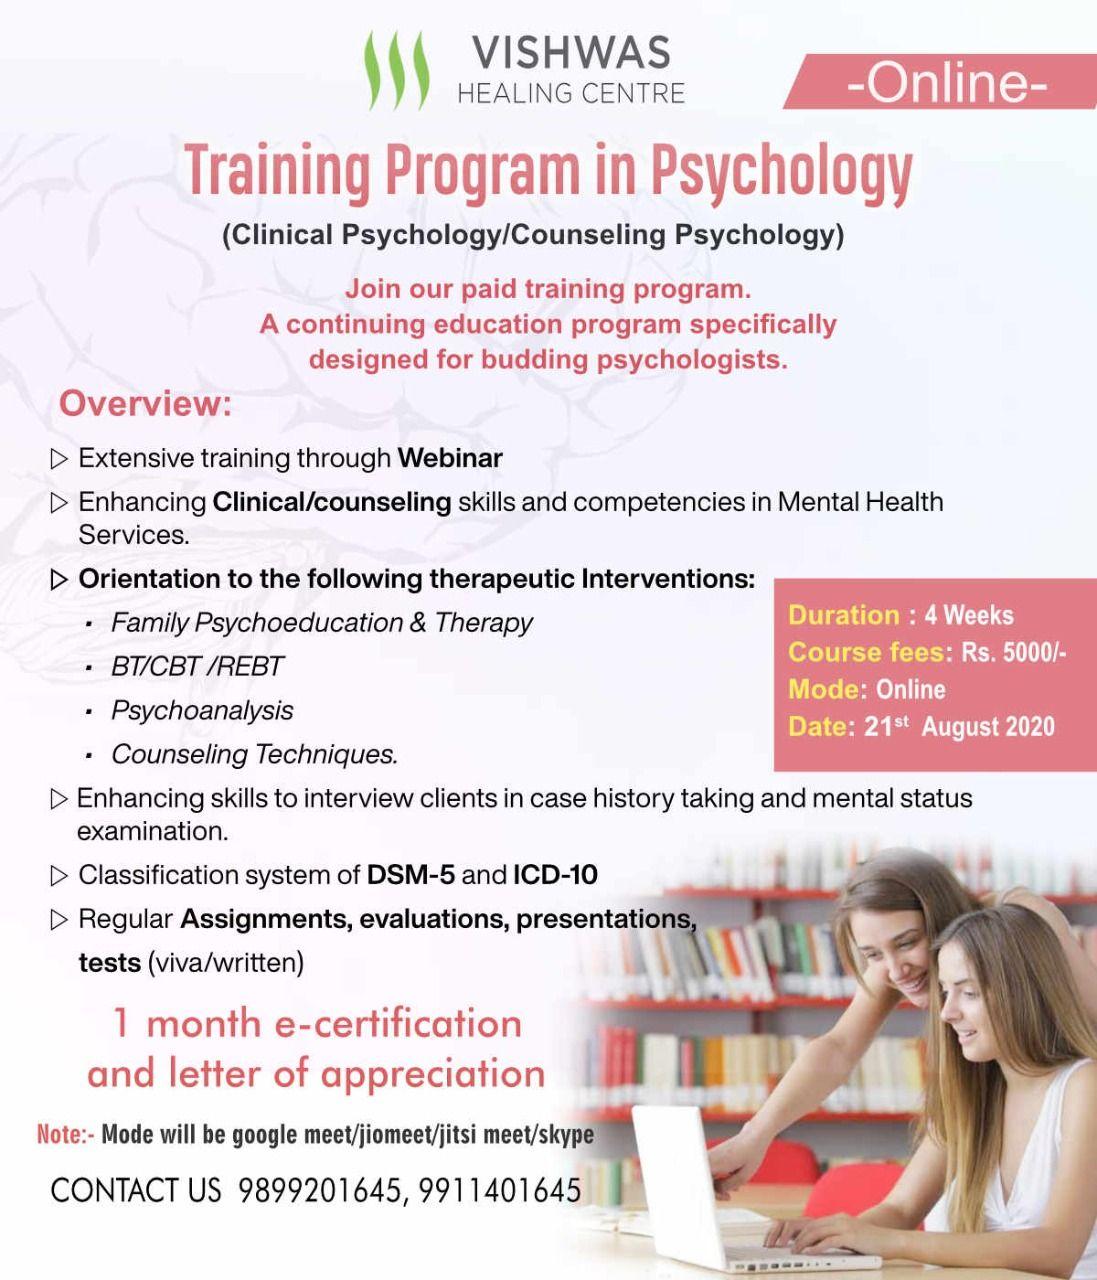 Online Training Program In Psychology In 2020 Psychology Internships Counseling Psychology Clinical Psychology